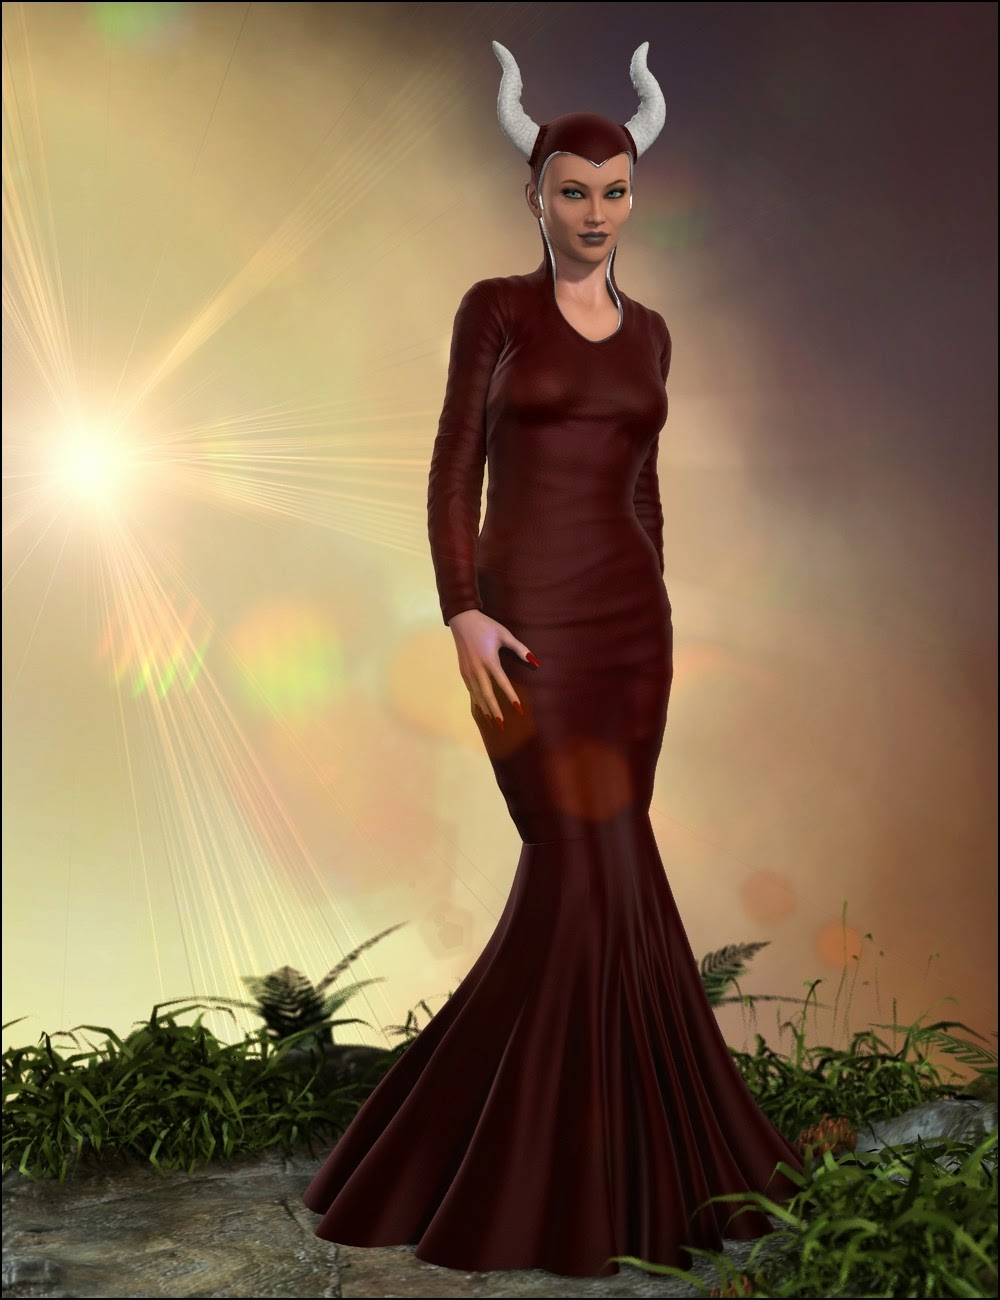 Méchante reine Outfit